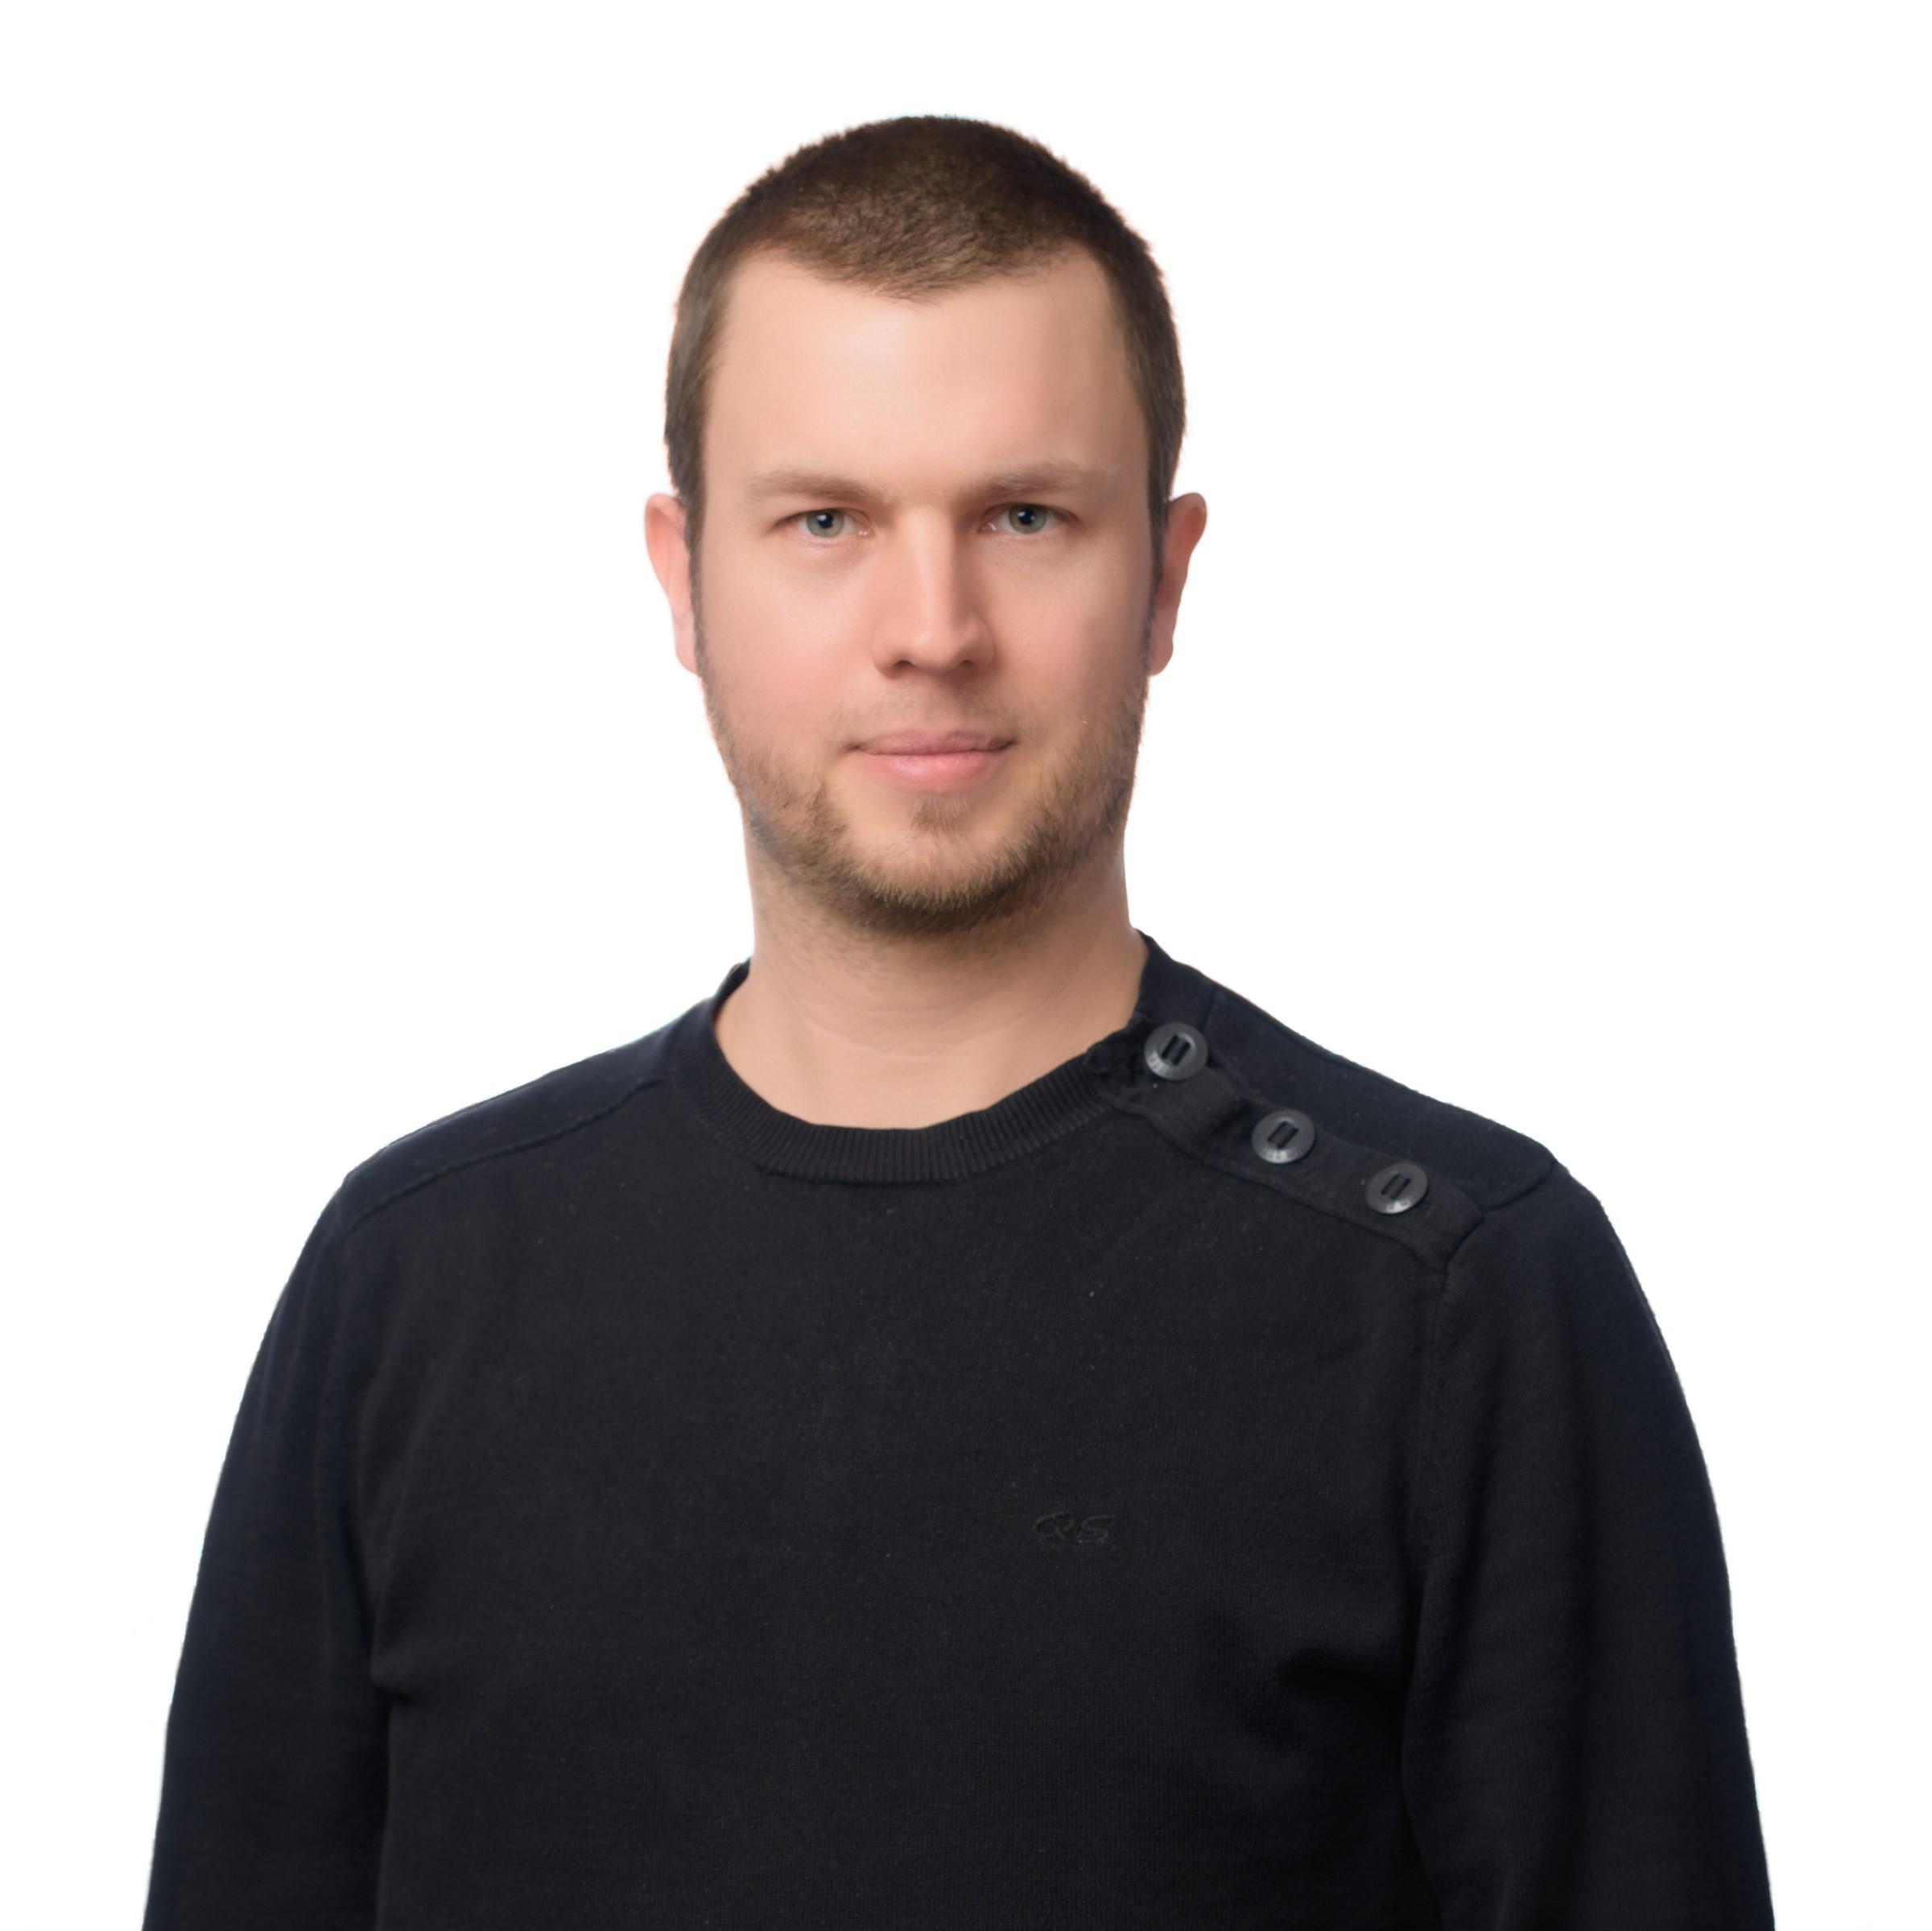 Dominik Strohmeier